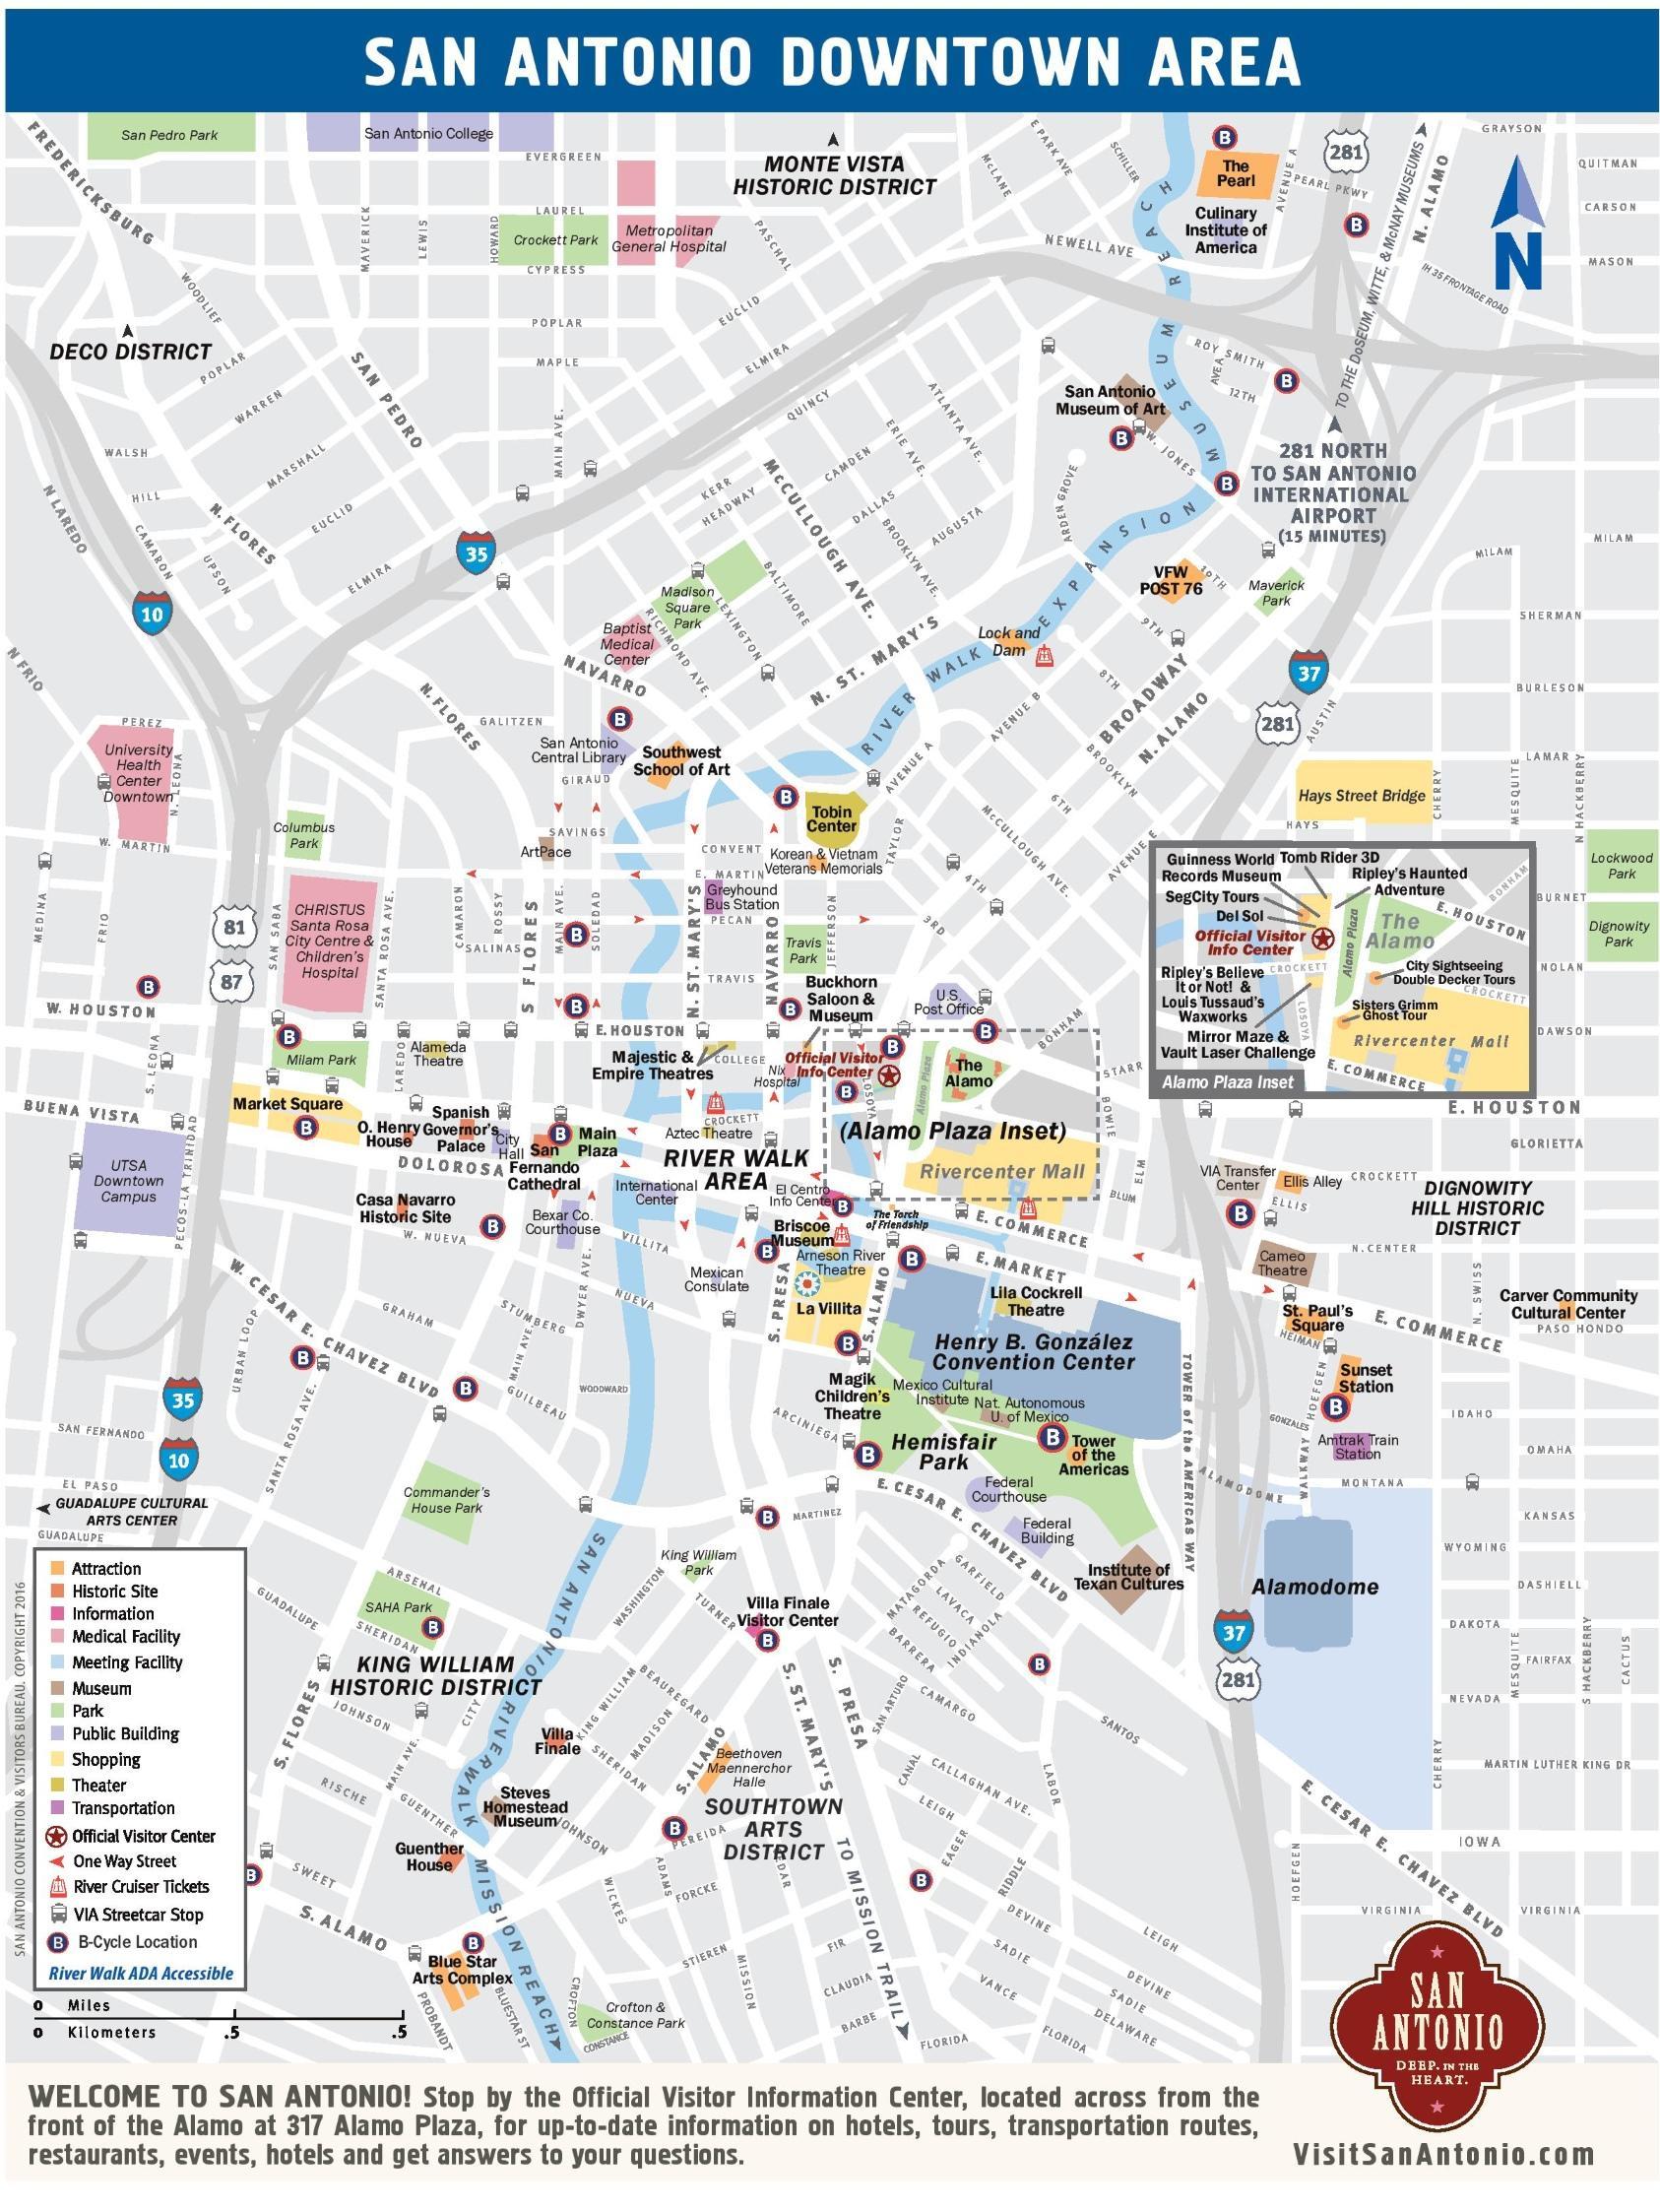 San Antonio Map - Maps San Antonio (Texas - Usa) - Map Of San Antonio Texas And Surrounding Area